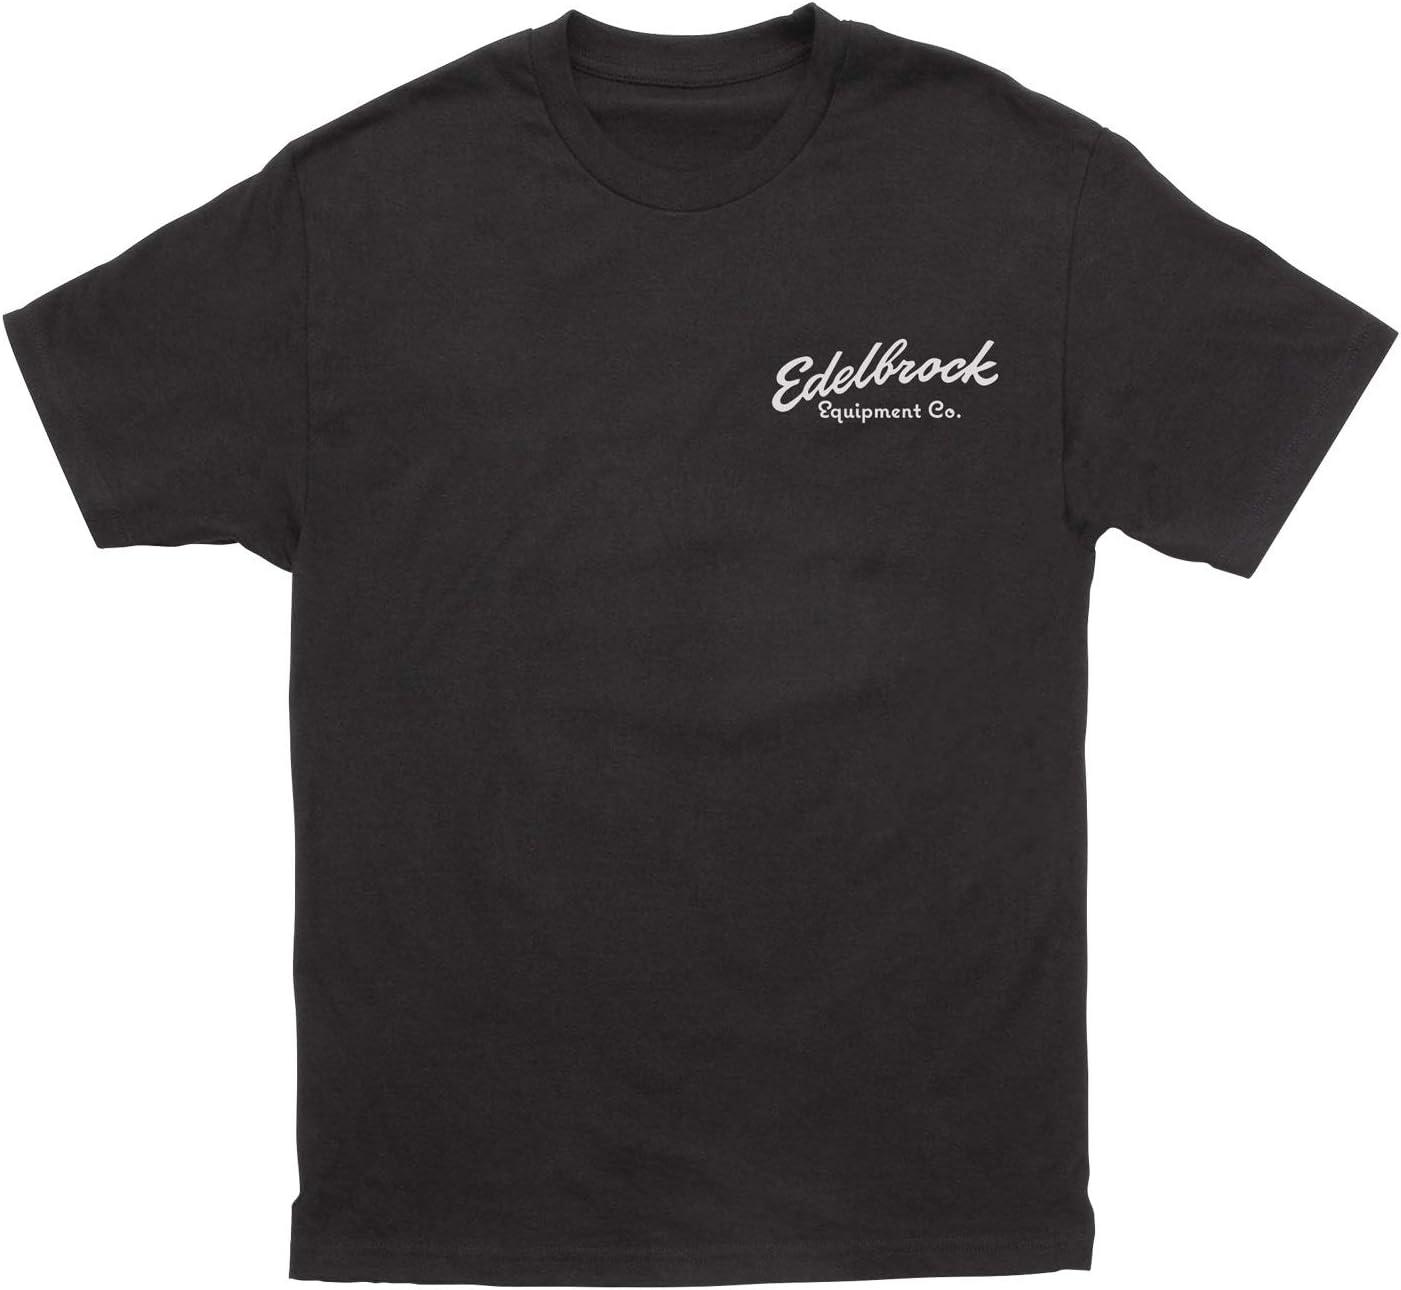 Edelbrock 98367 T-SHIRT